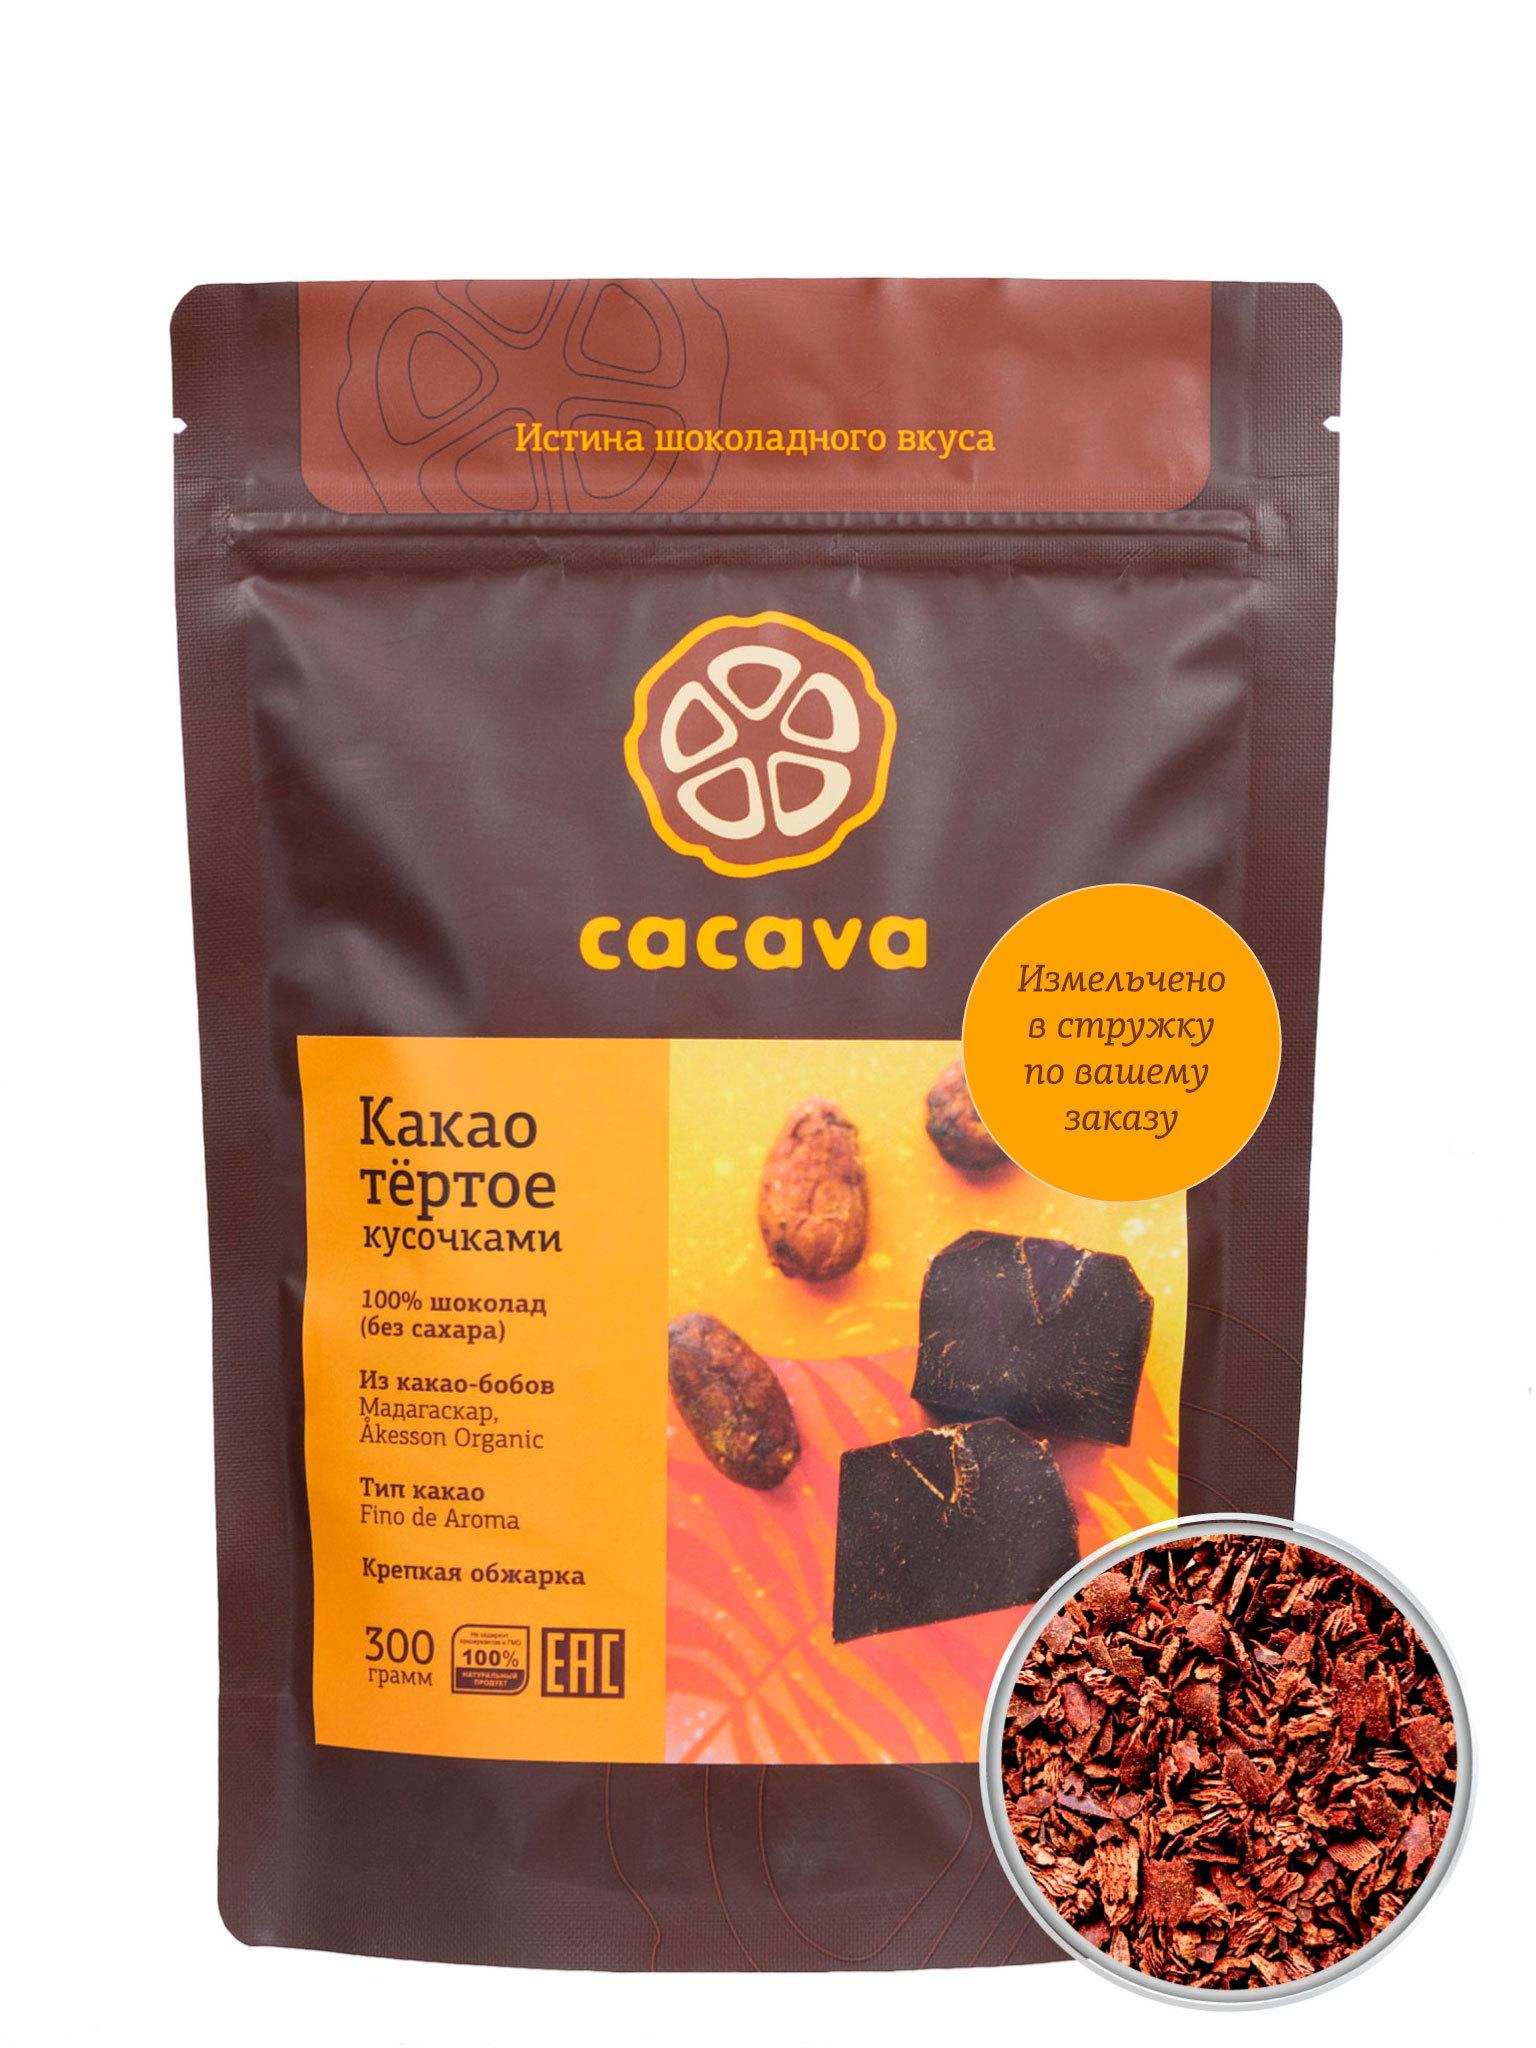 Какао тёртое в стружке (Мадагаскар, Åkesson), упаковка 300 грамм